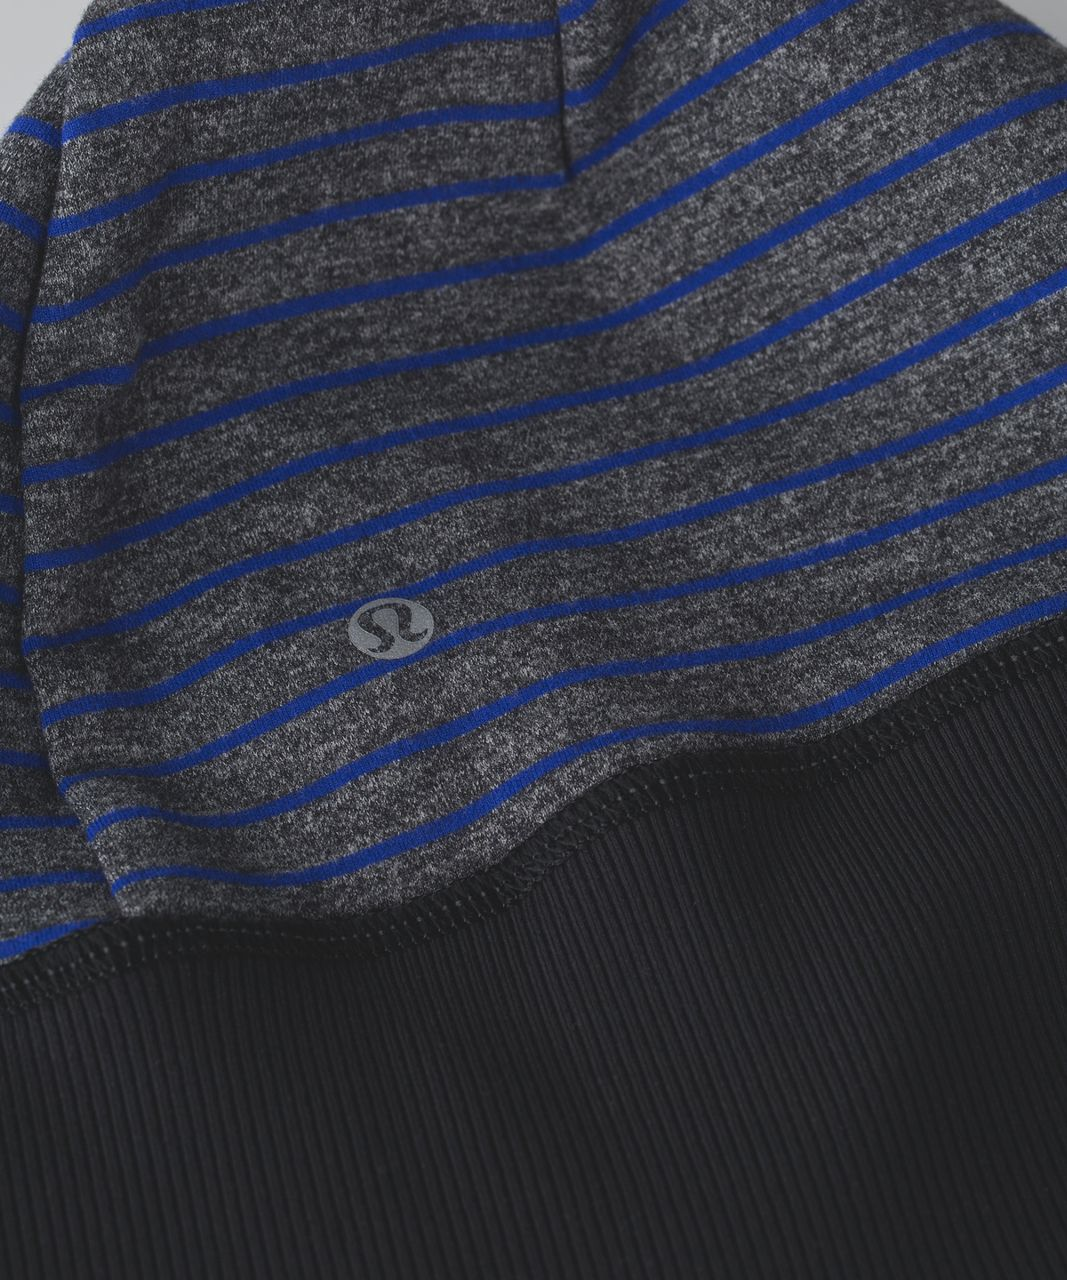 Lululemon Run With Me Toque - Parallel Stripe Pigment Blue Heathered Black / Heathered Black / Black